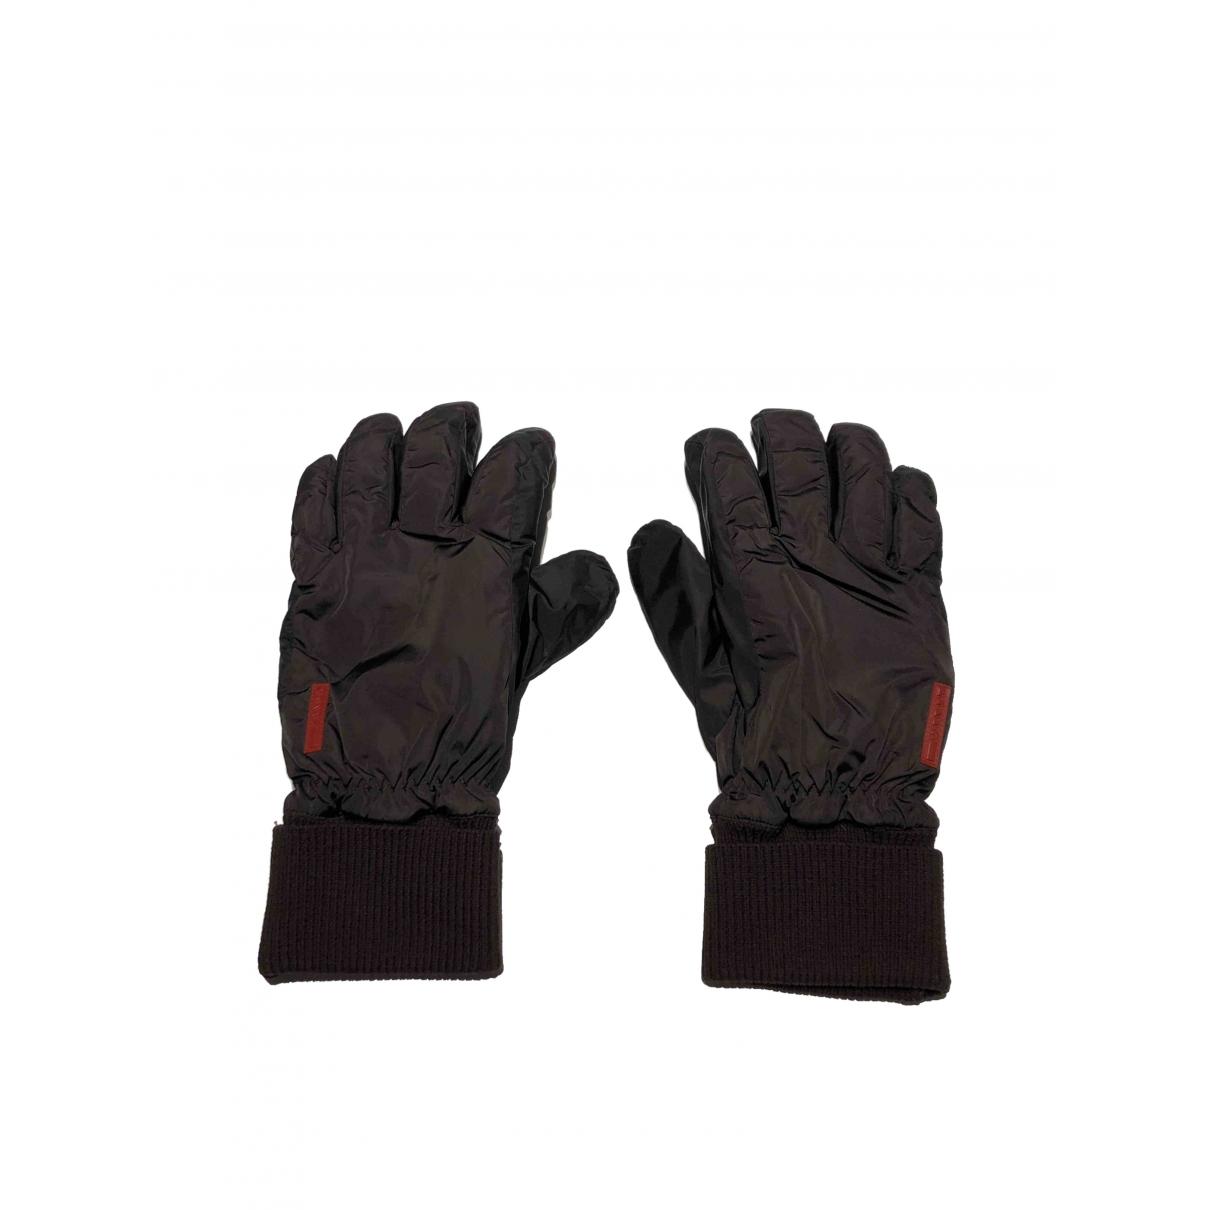 Prada \N Brown Gloves for Men M International